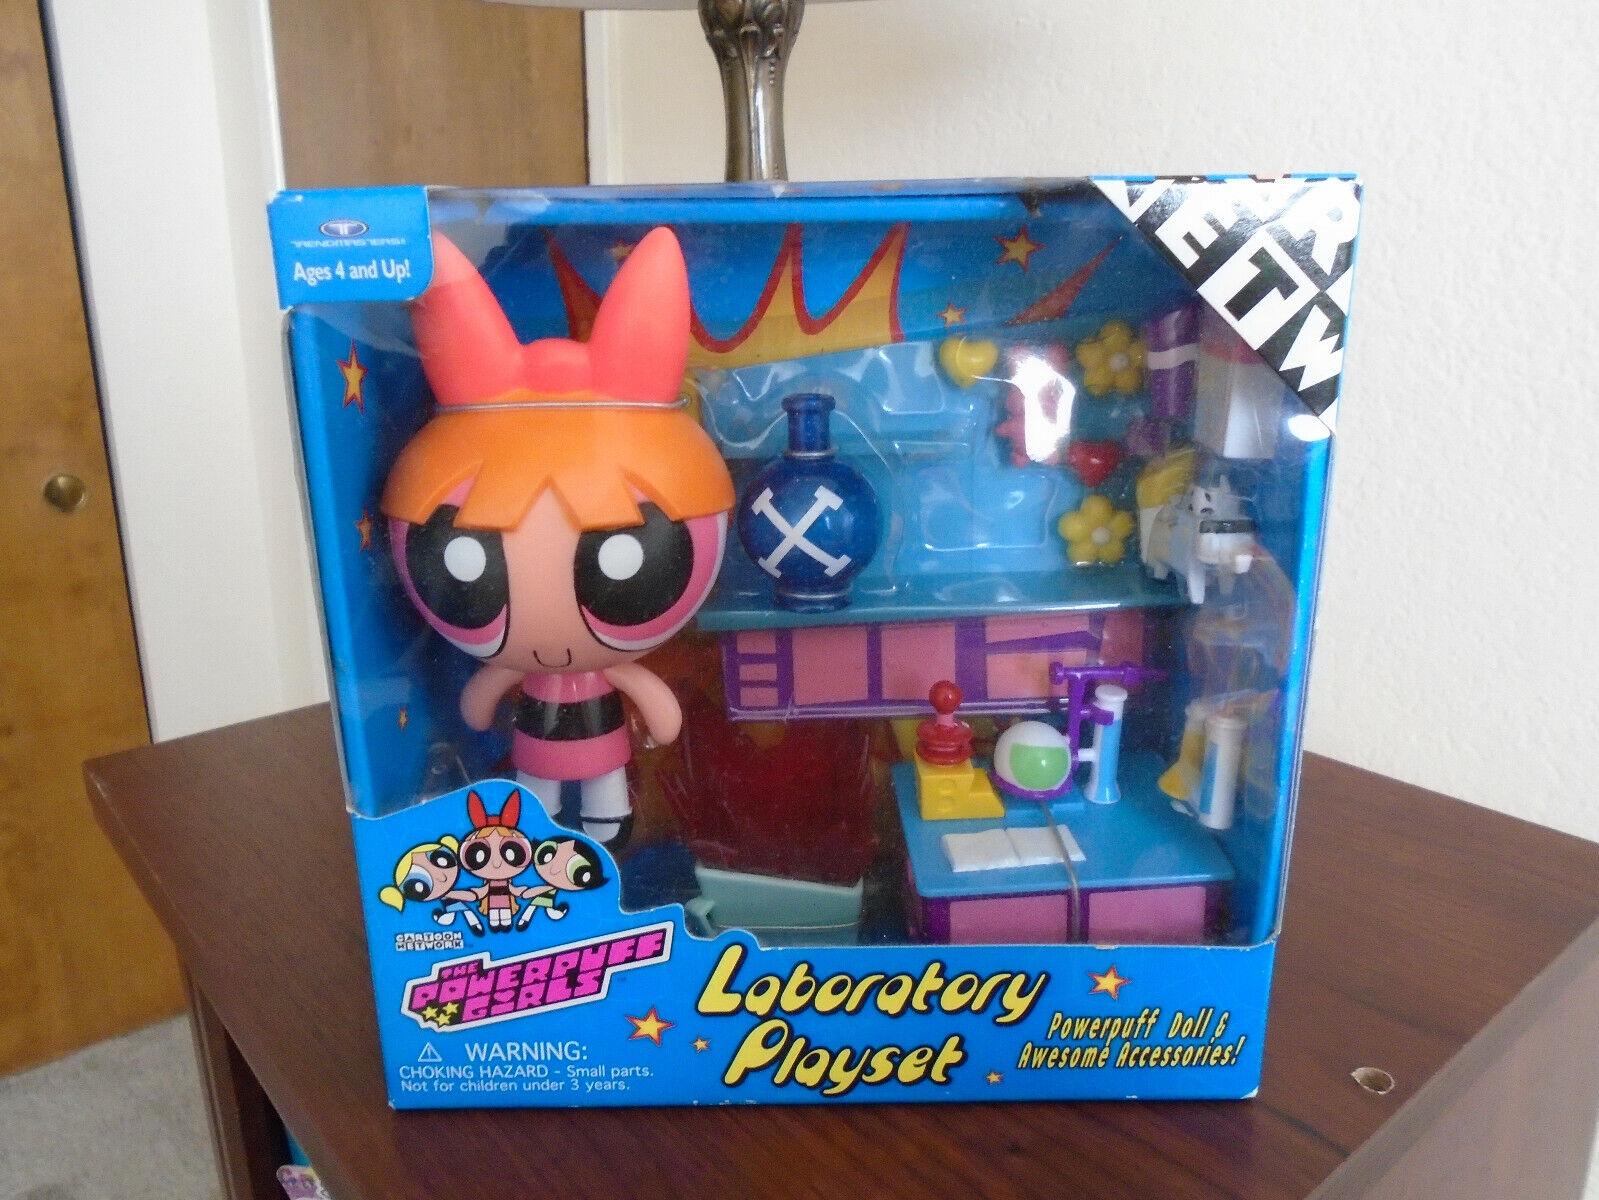 NEW Cartoon Network PowerPuff Girls Laboratory Playset BLOSSOM - NRFB MIP, 1999